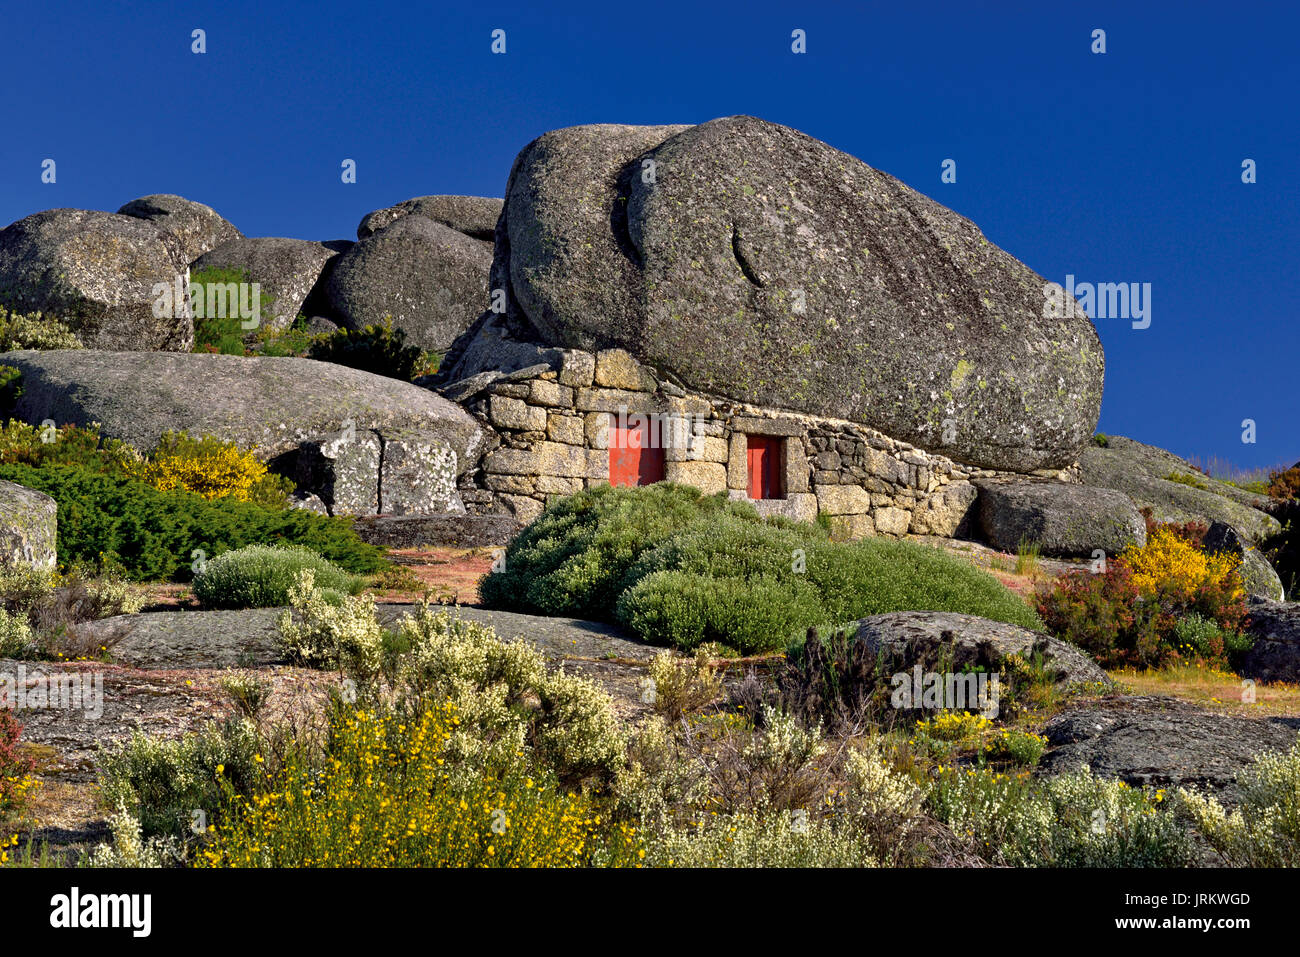 Tiny stone house under huge granite rock - Stock Image